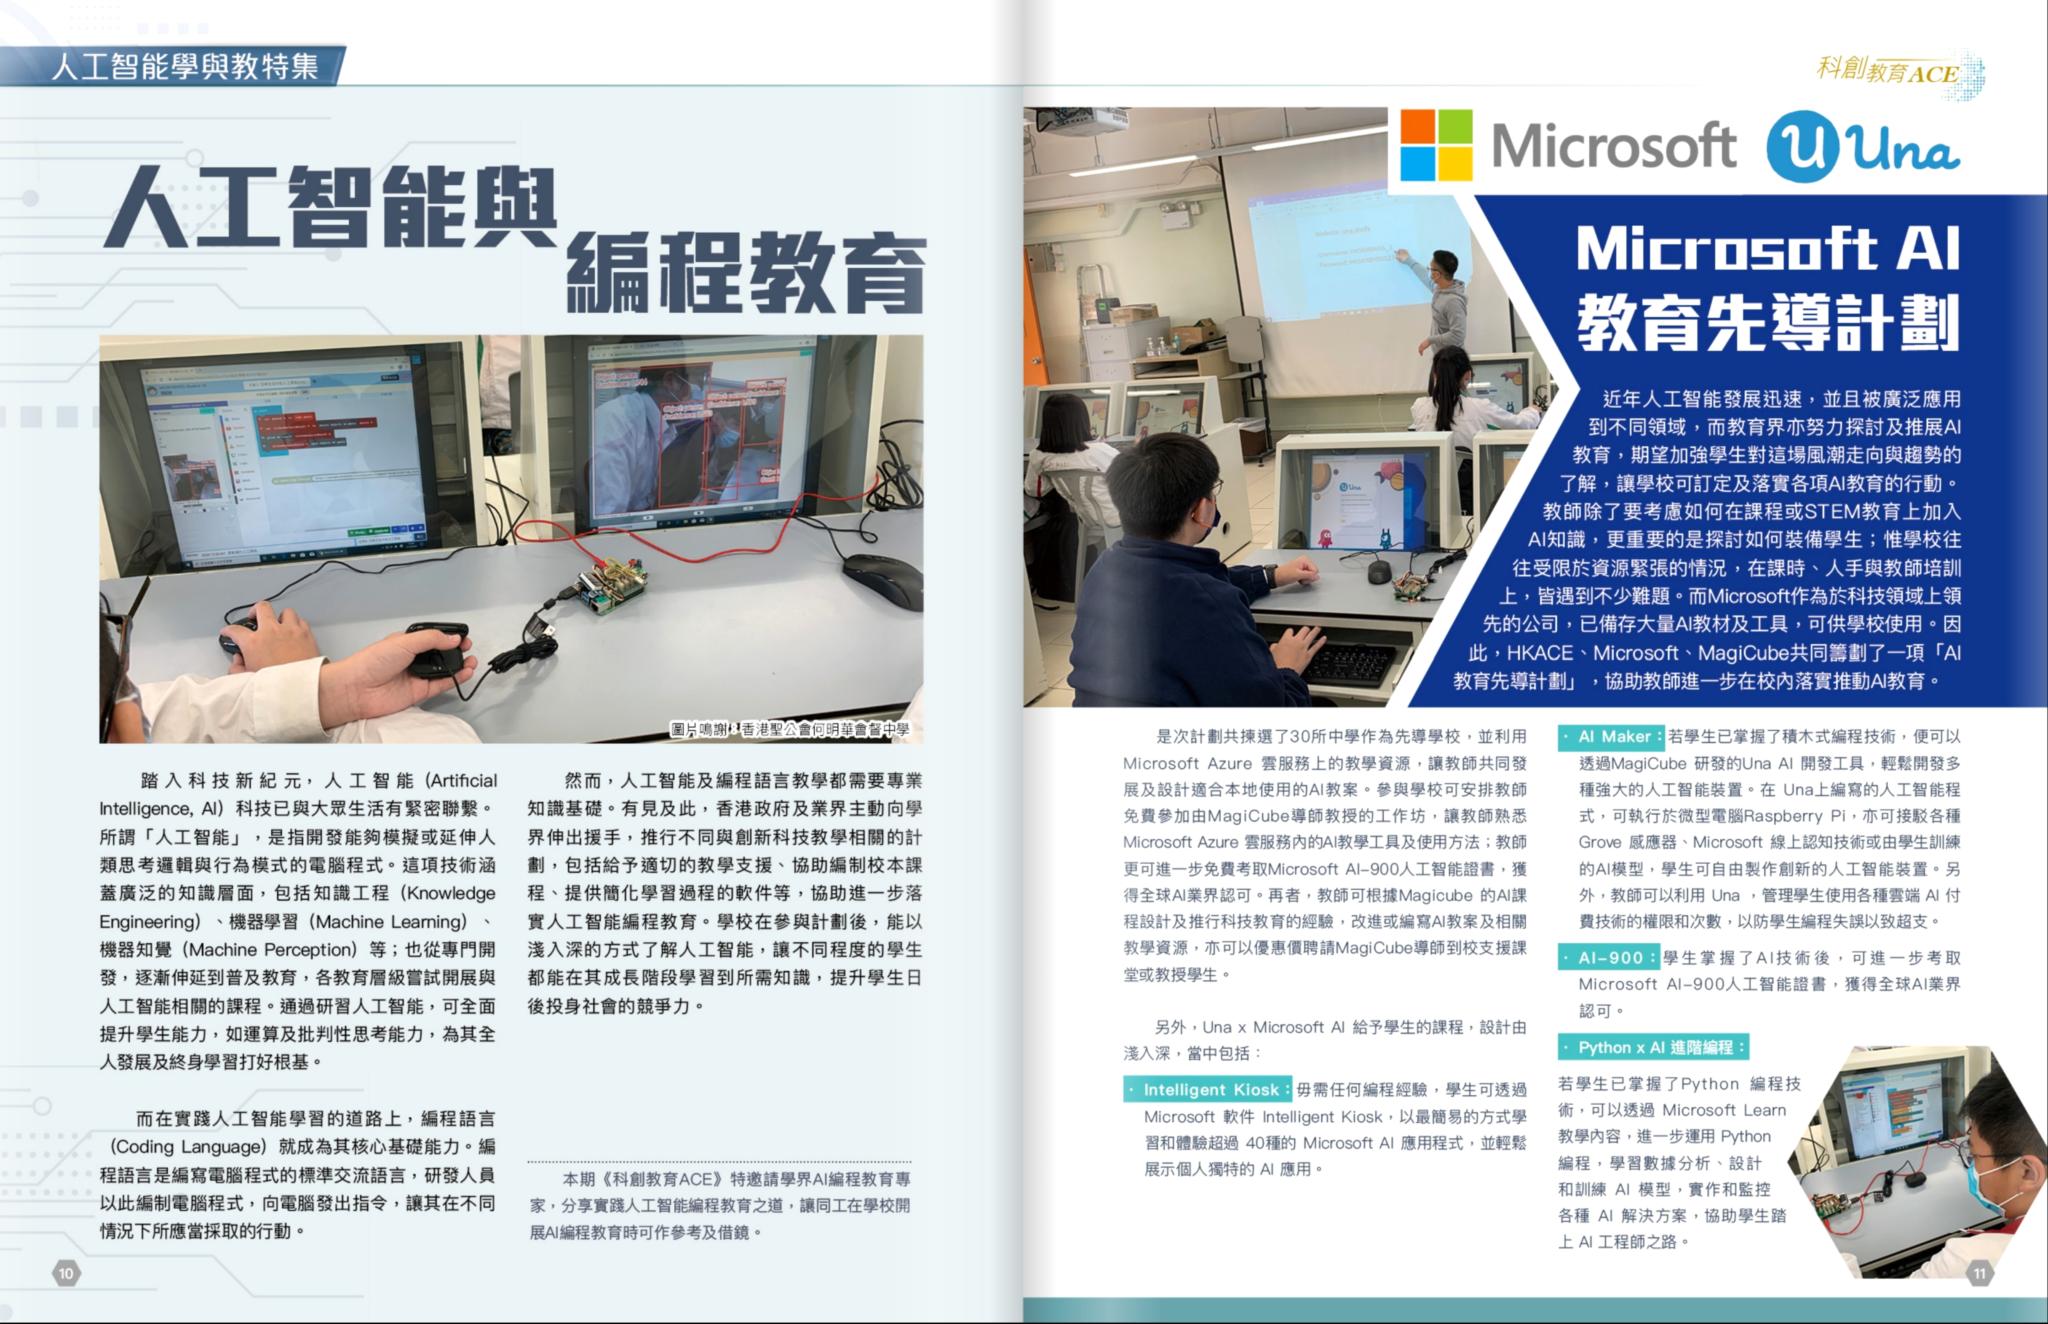 Una x Microsoft x HKACE - AI Pilot Schools